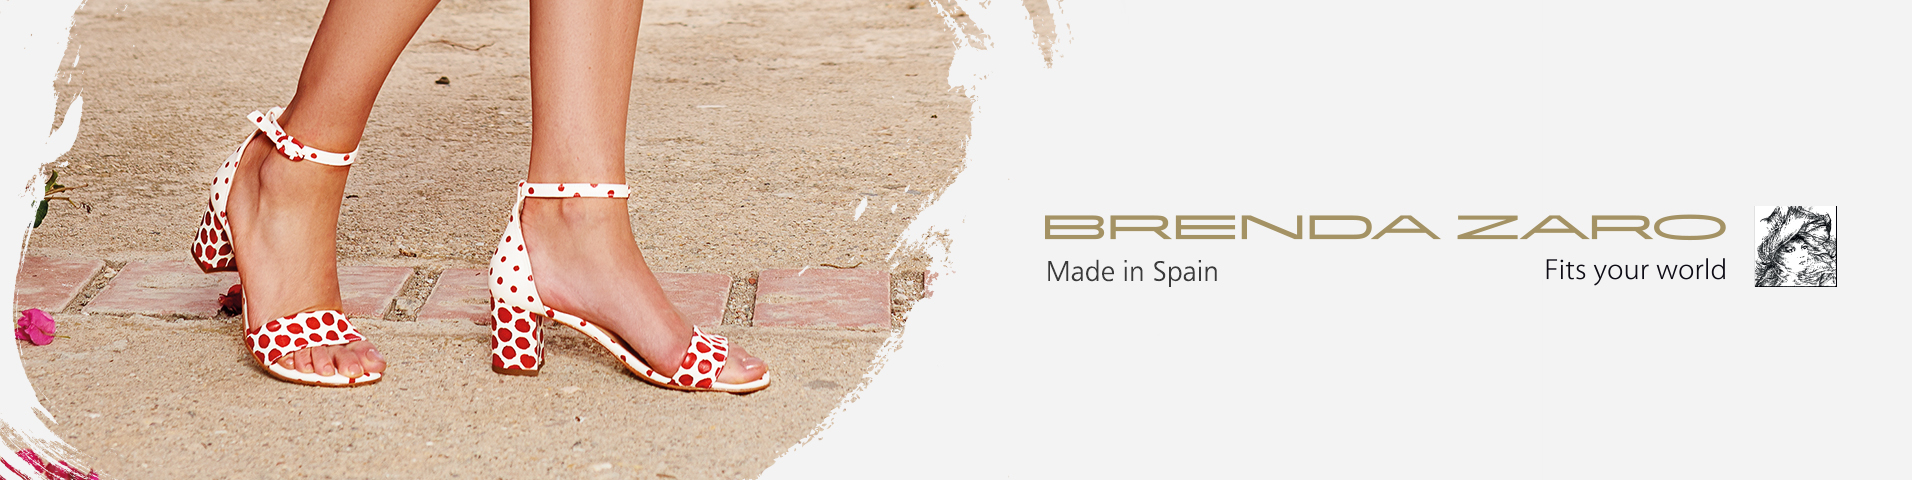 b413c0305809e Brenda Zaro Online-Shop | Brenda Zaro bezpłatna przesyłka